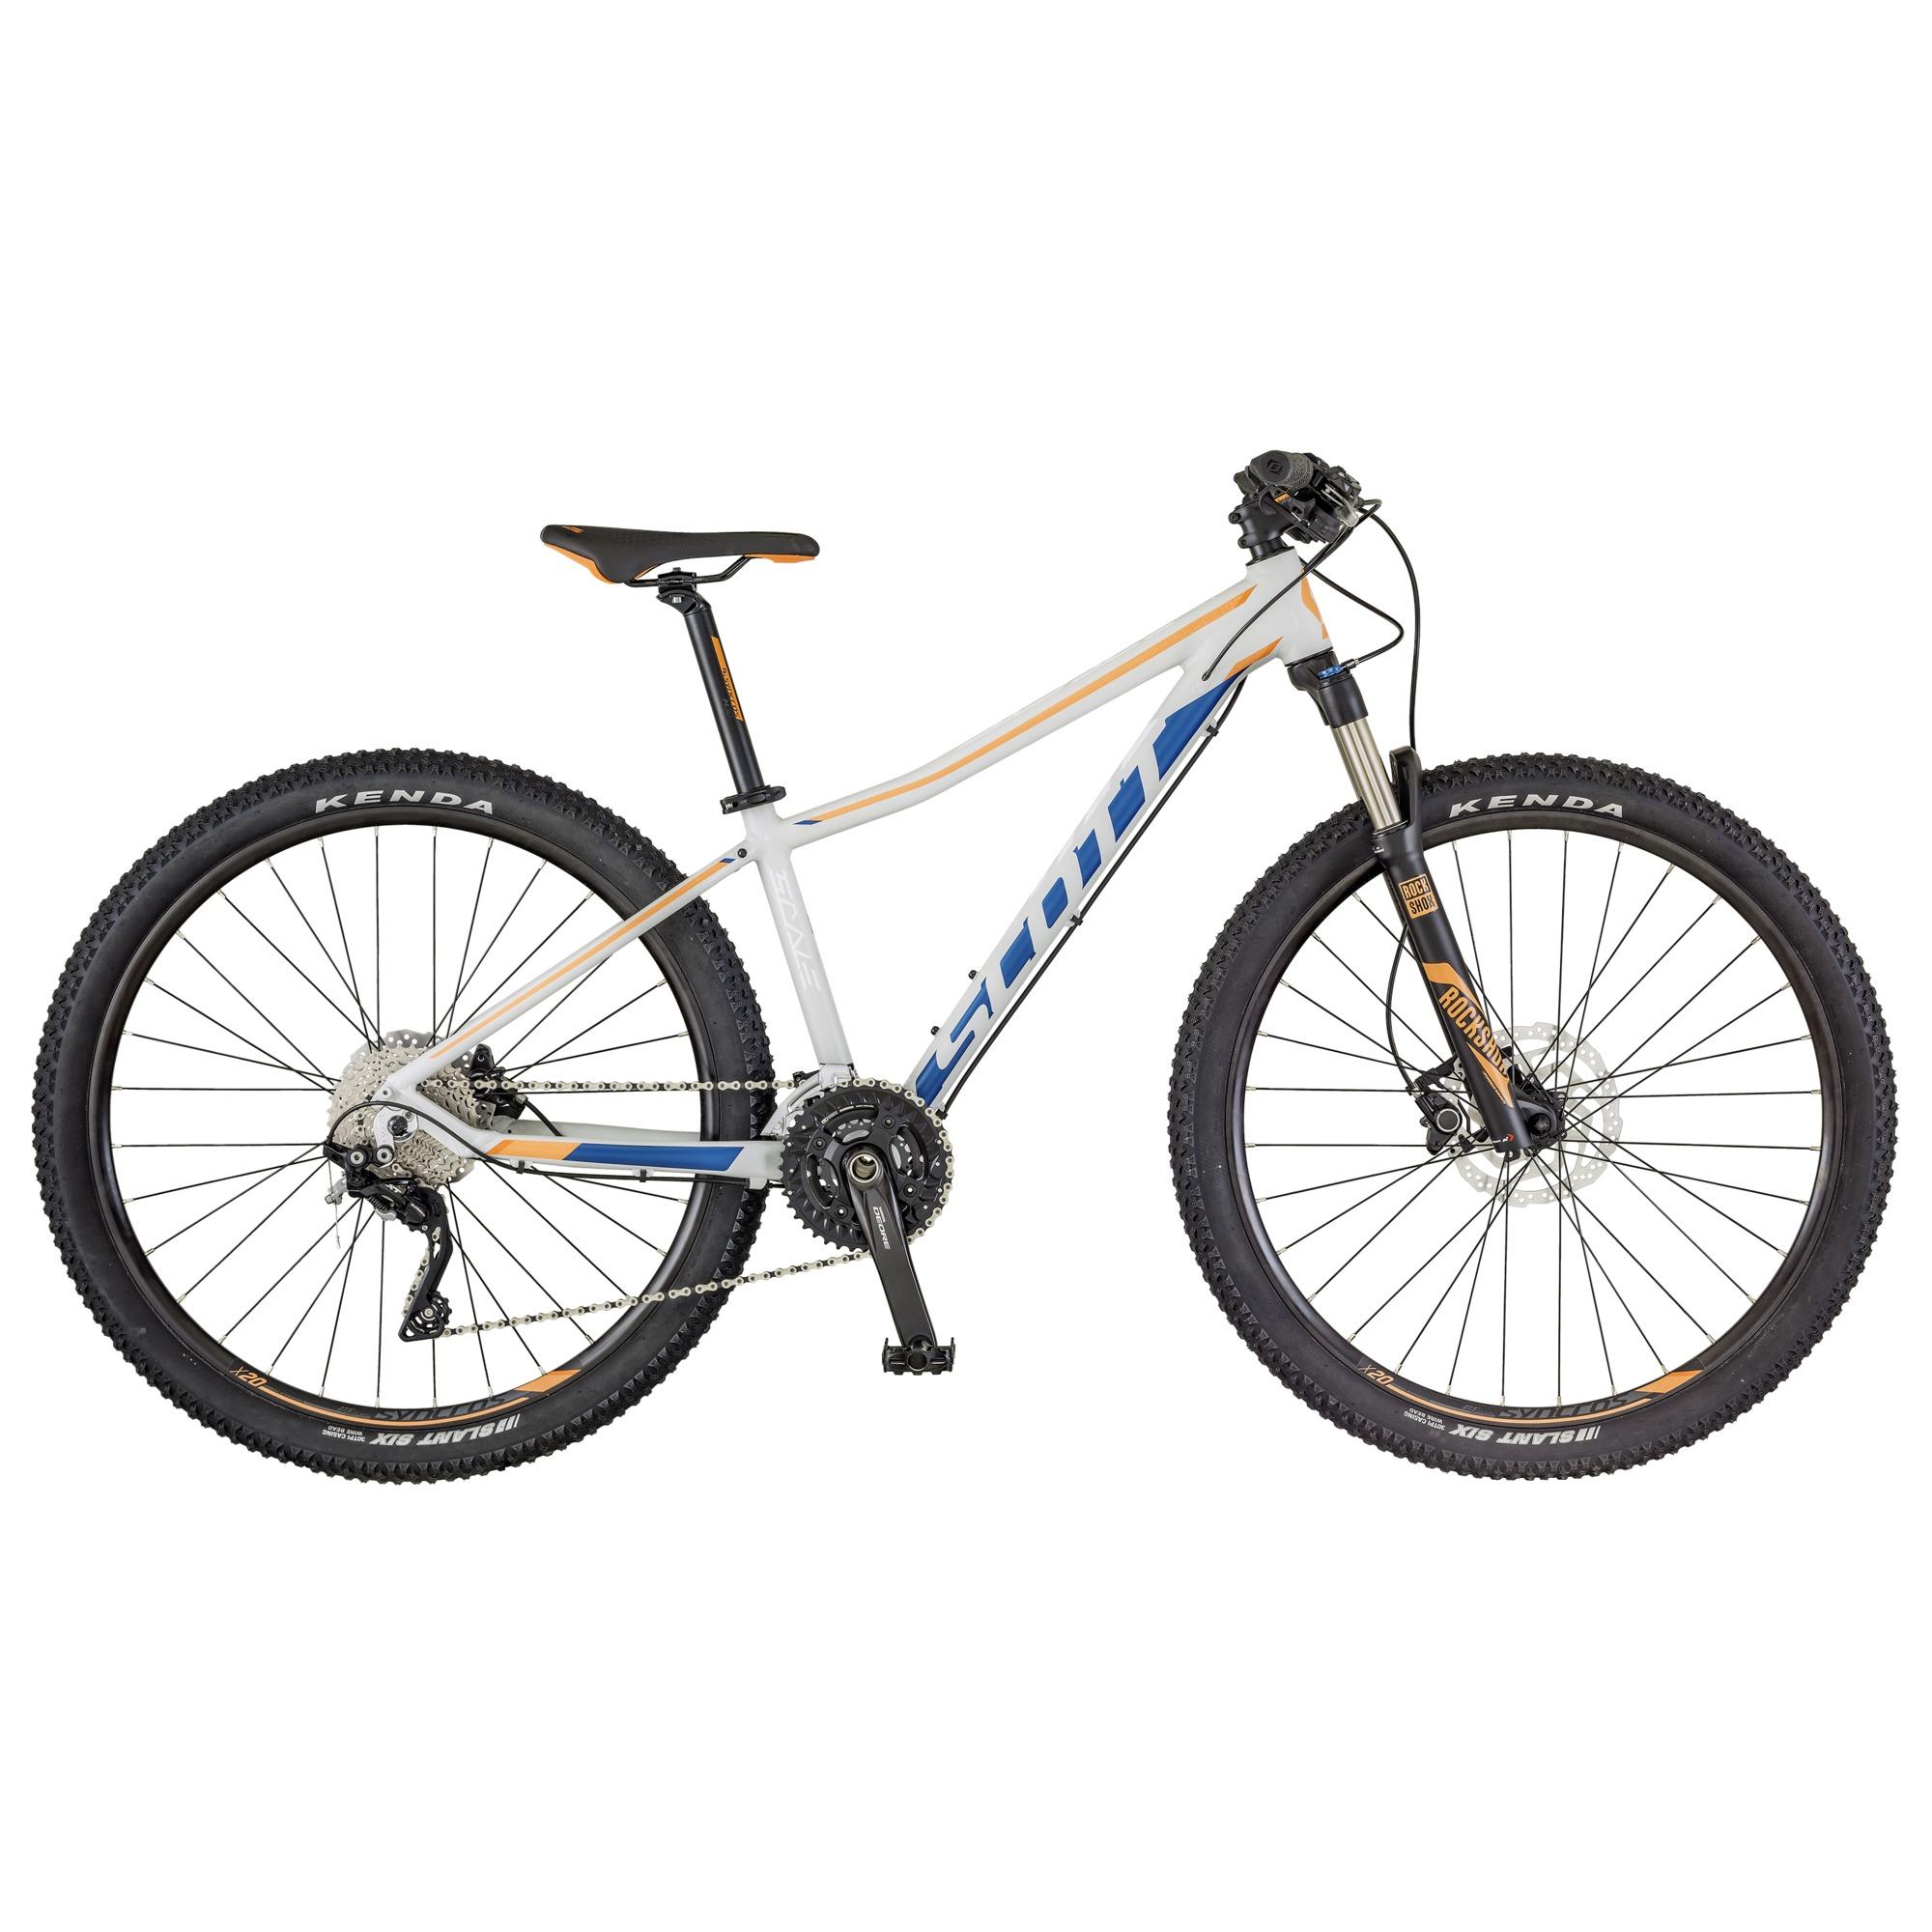 SCOTT Contessa Scale 20 Bike L9 - Zweirad Homann